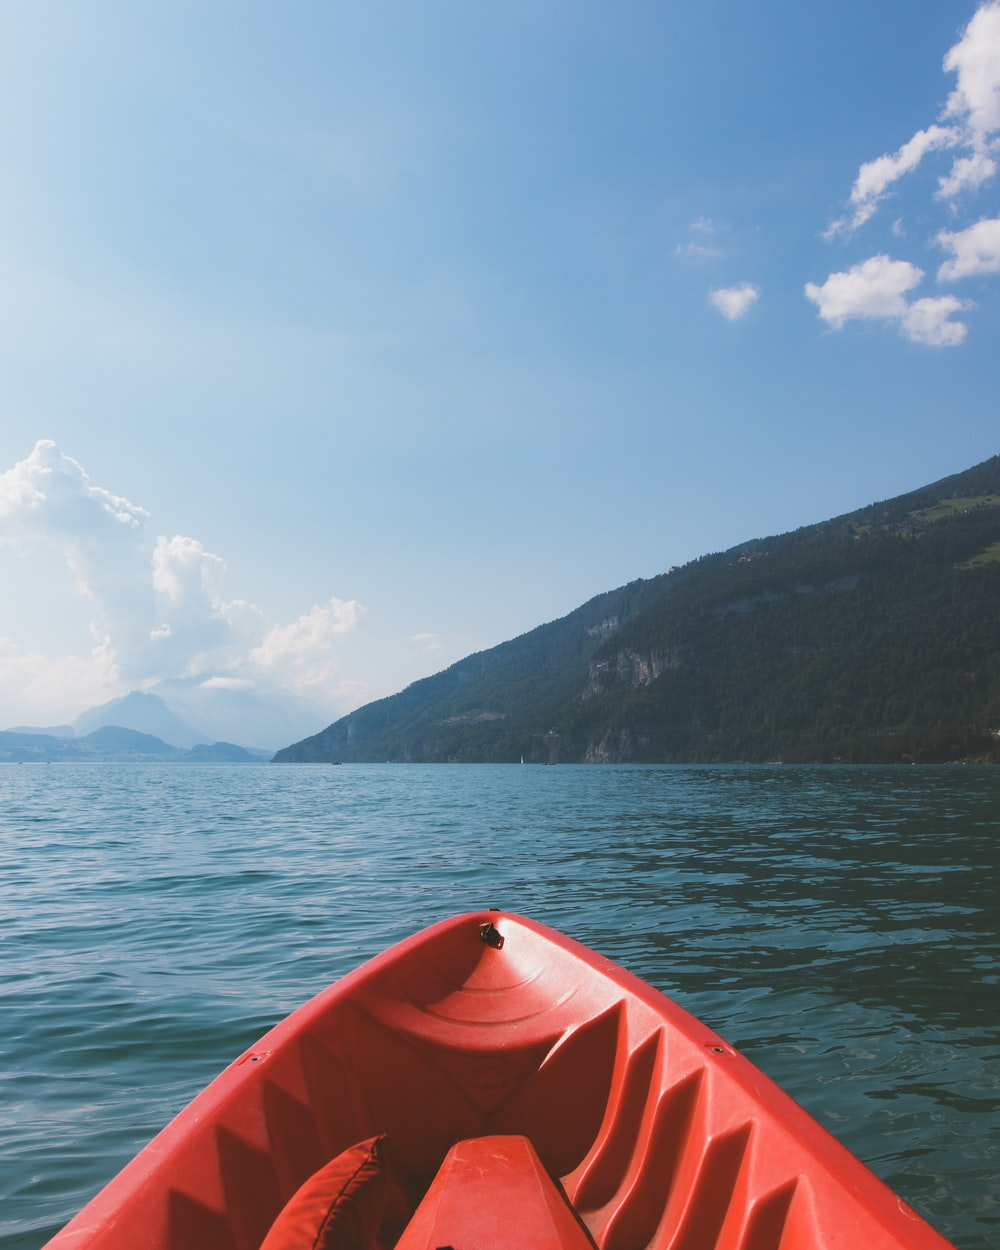 red kayak on sea near mountain under blue sky during daytime